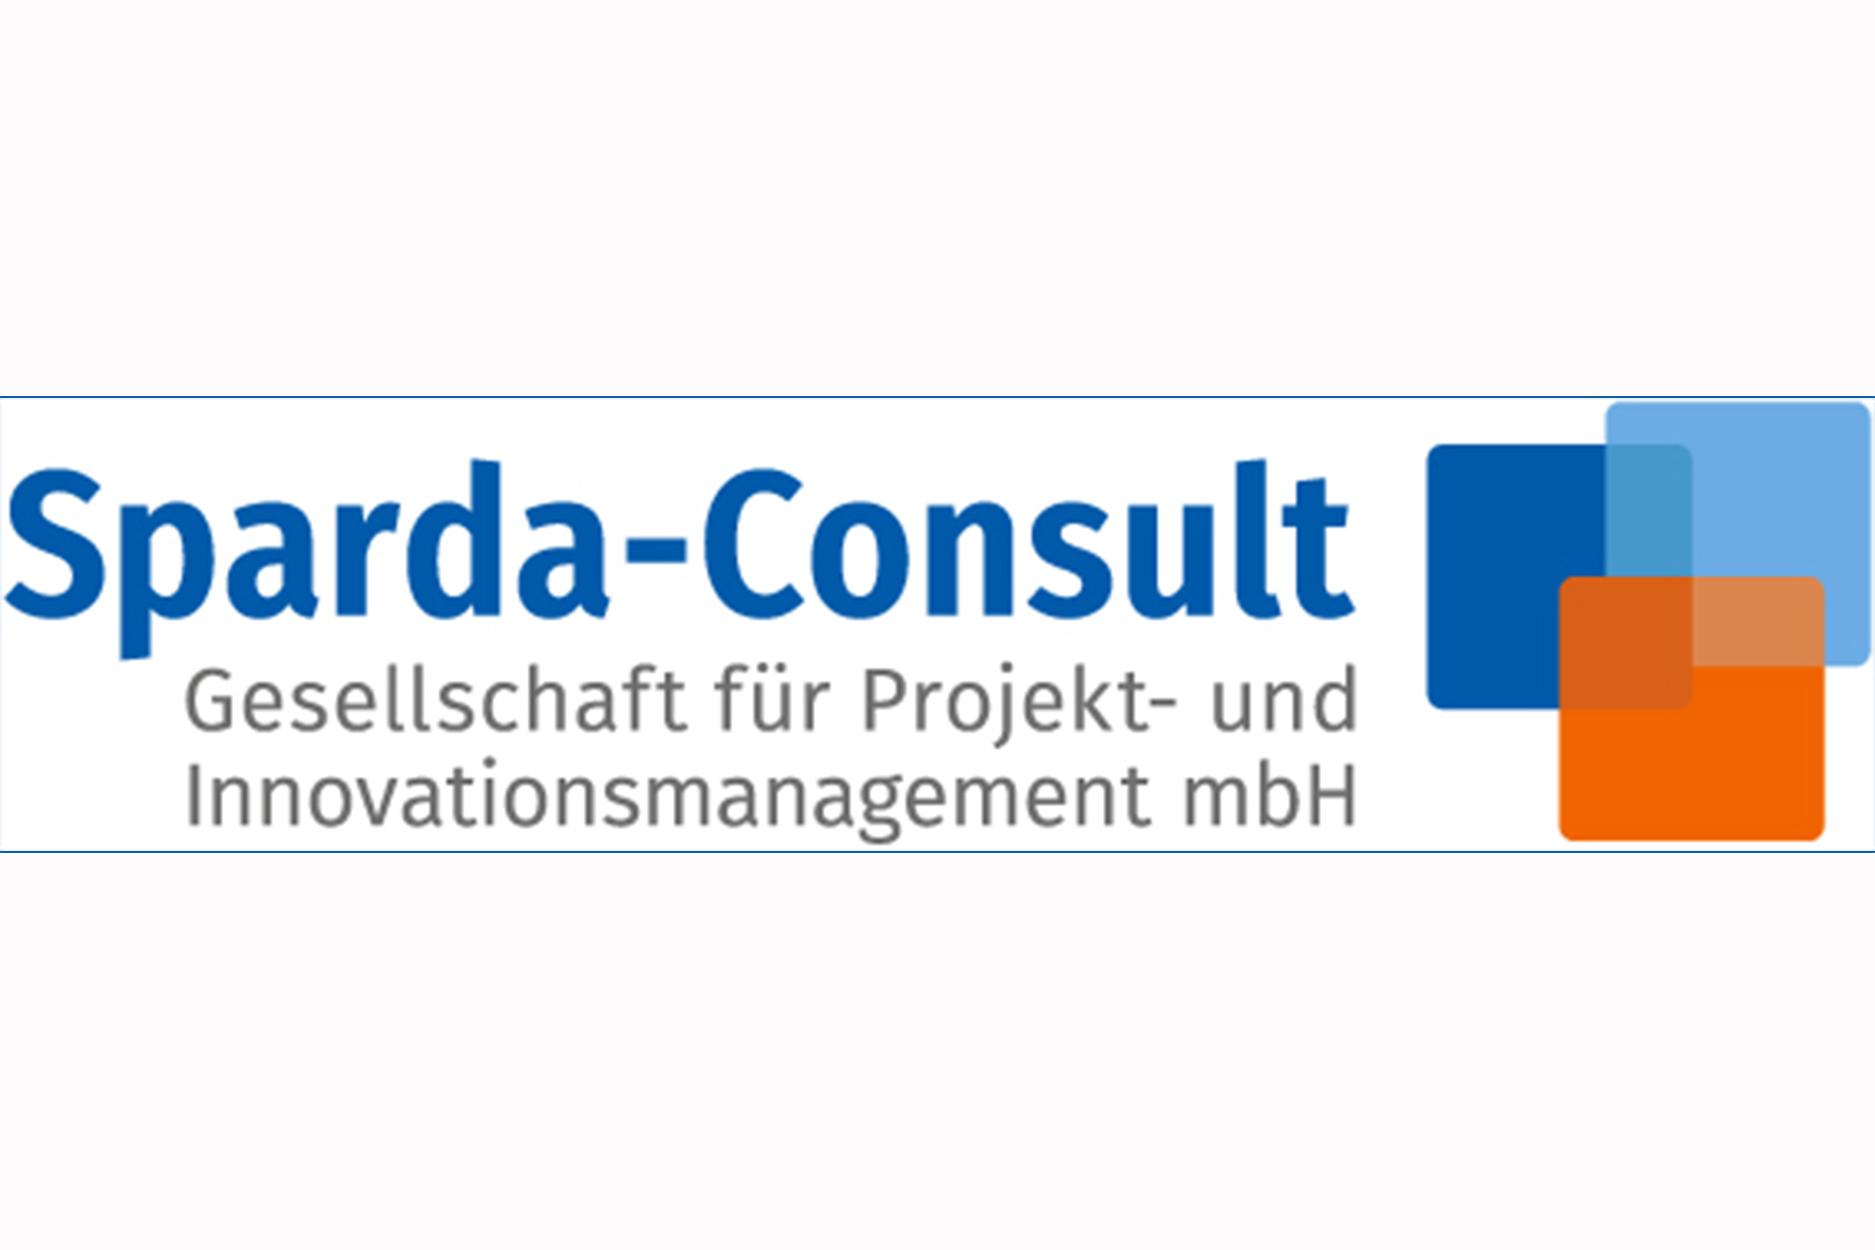 Sparda-Consult Logo